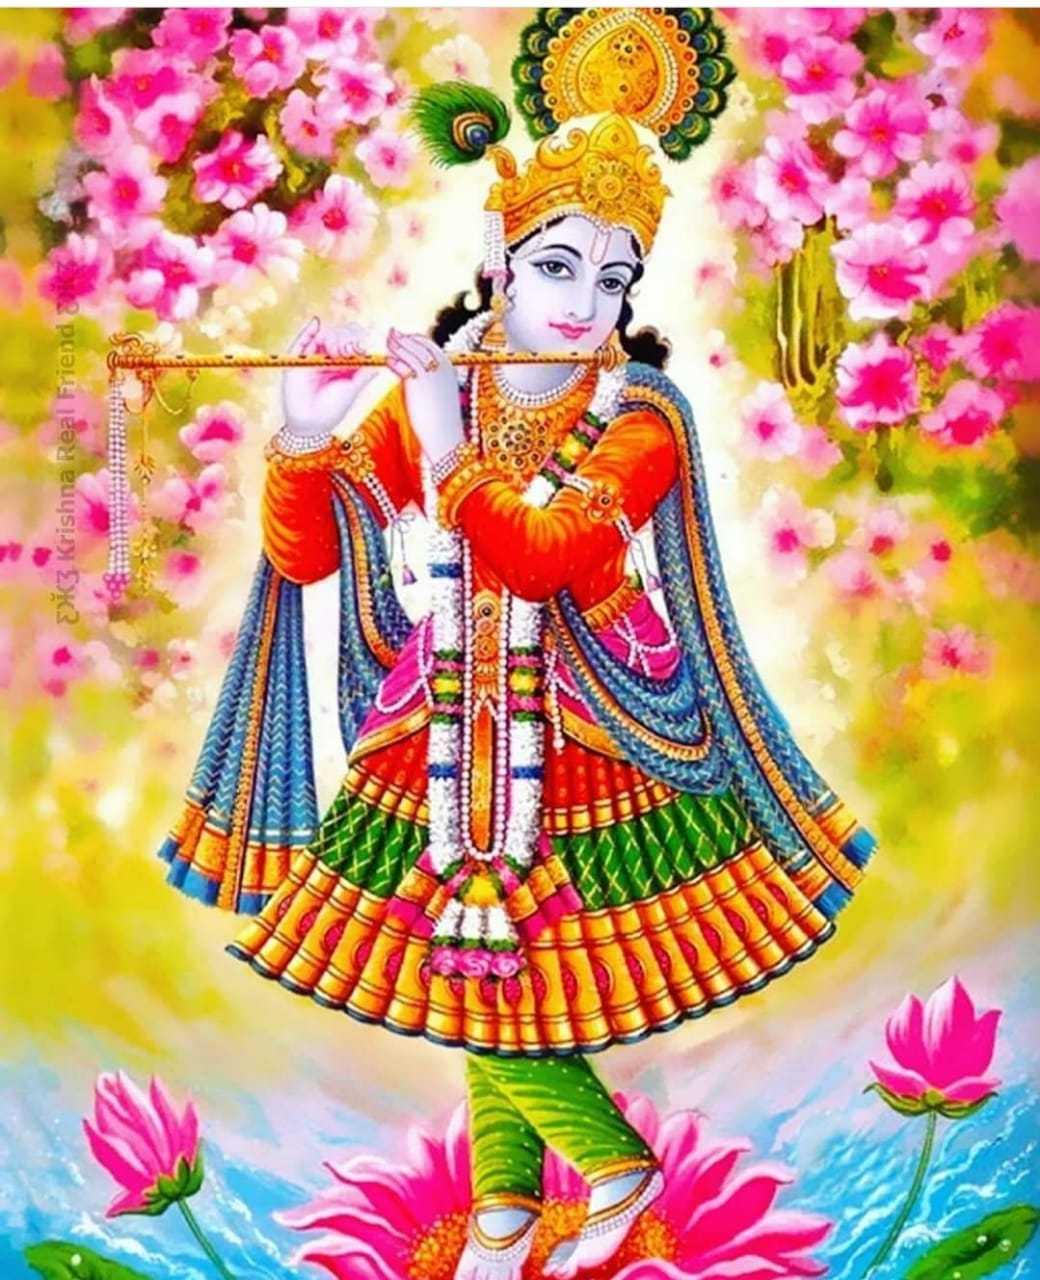 Good Morning Wallpaper with Beautiful God Krishna - Download the perfect cute krishna pics for wallpaper hd 1080p. Lord Krishna HD Wallpapers 1920x1080 for desktop.